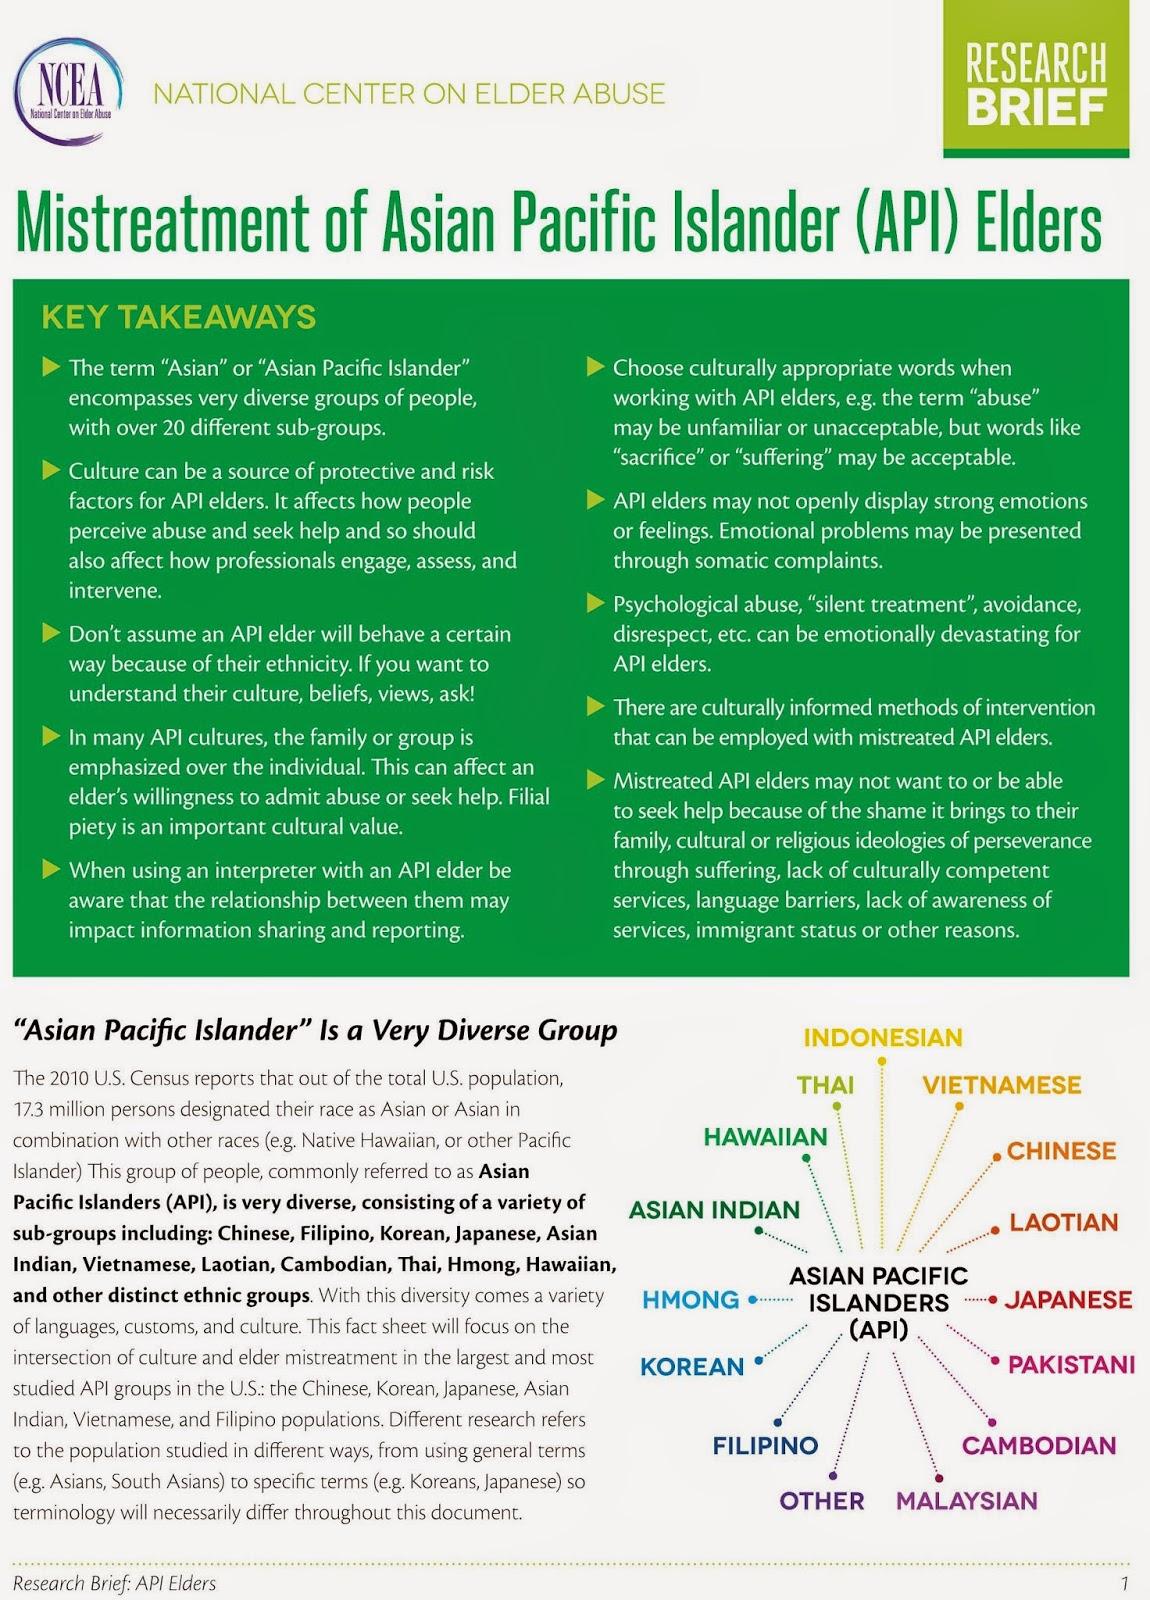 Read more on Mistreatment of Asian Pacific Islander (API) Elders